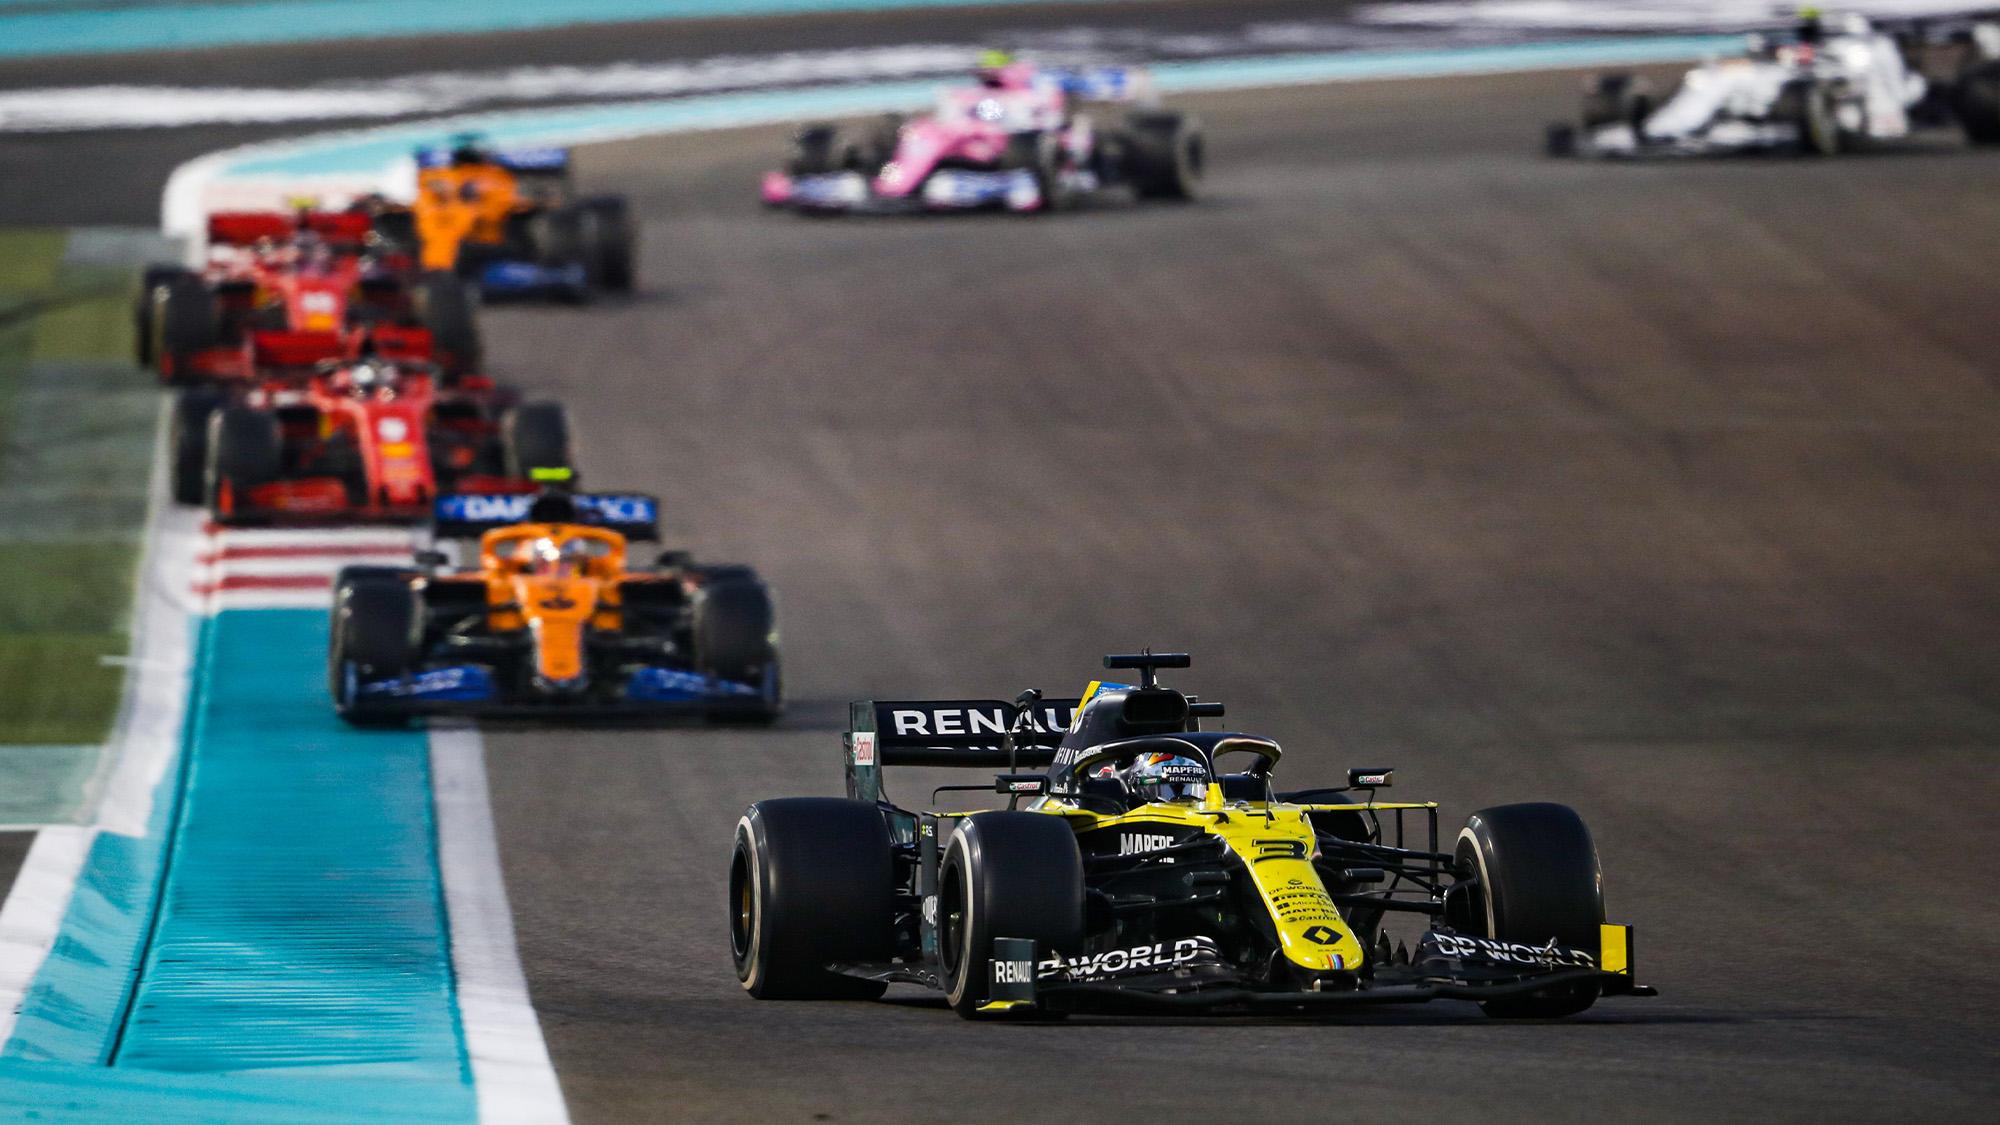 Daniel Ricciardo leads Lando Norris at the 2020 Abu Dhabi Grand Prix